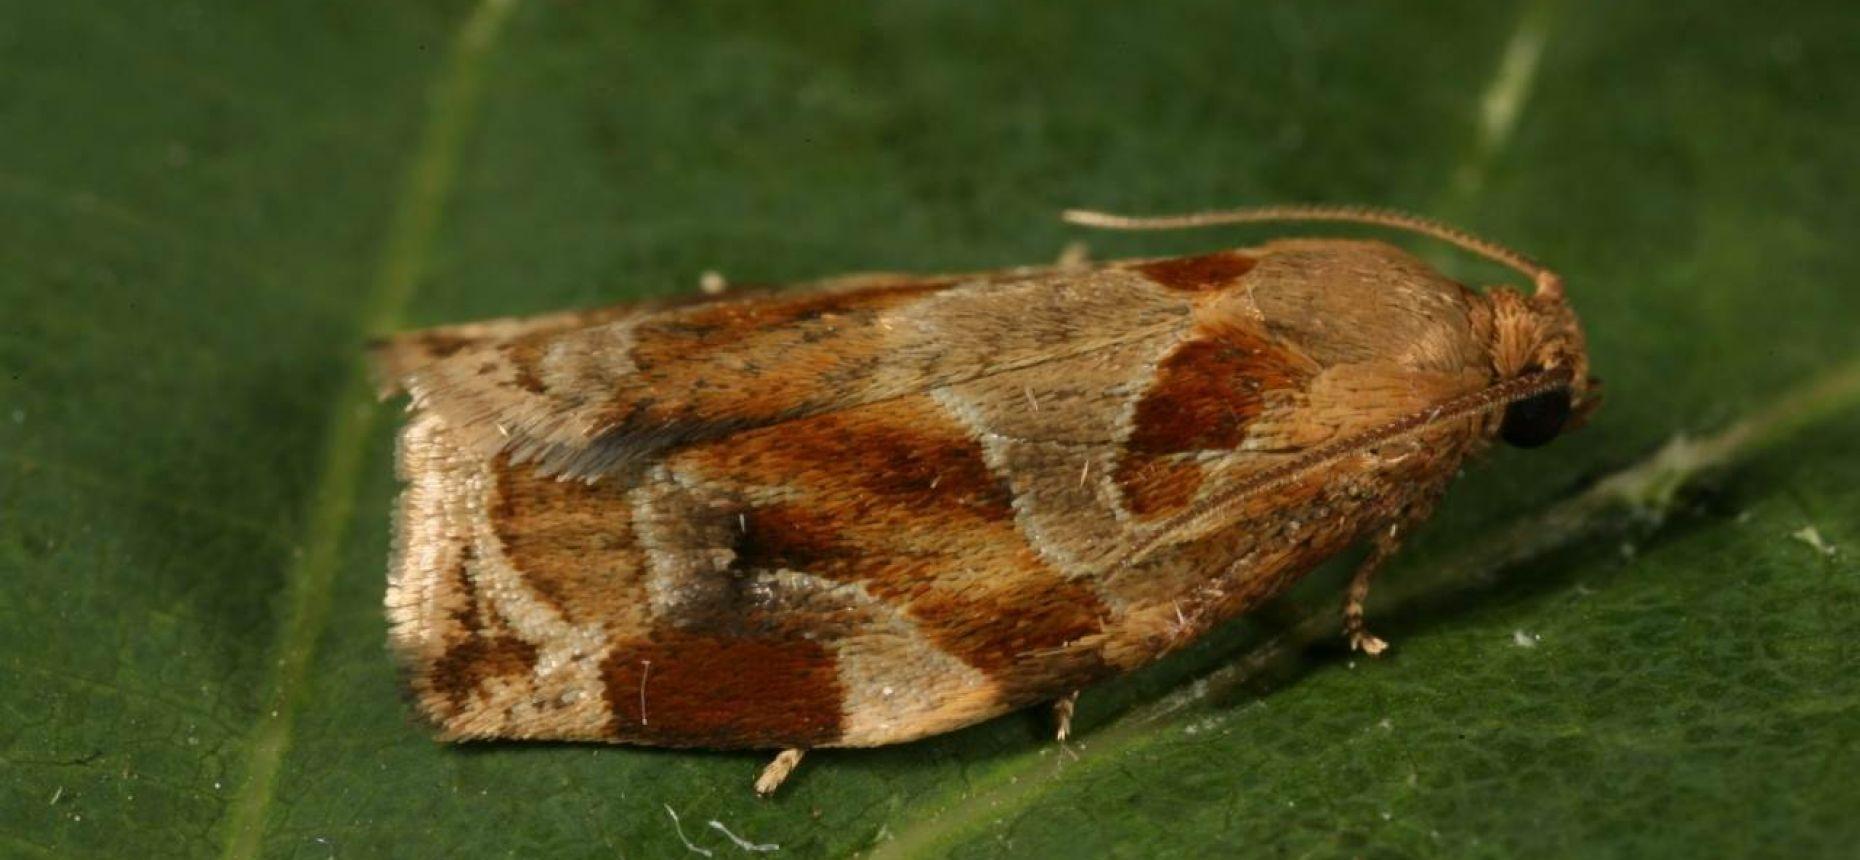 Пестро-золотистая листовертка-толстушка - Archips xylosteanaL.